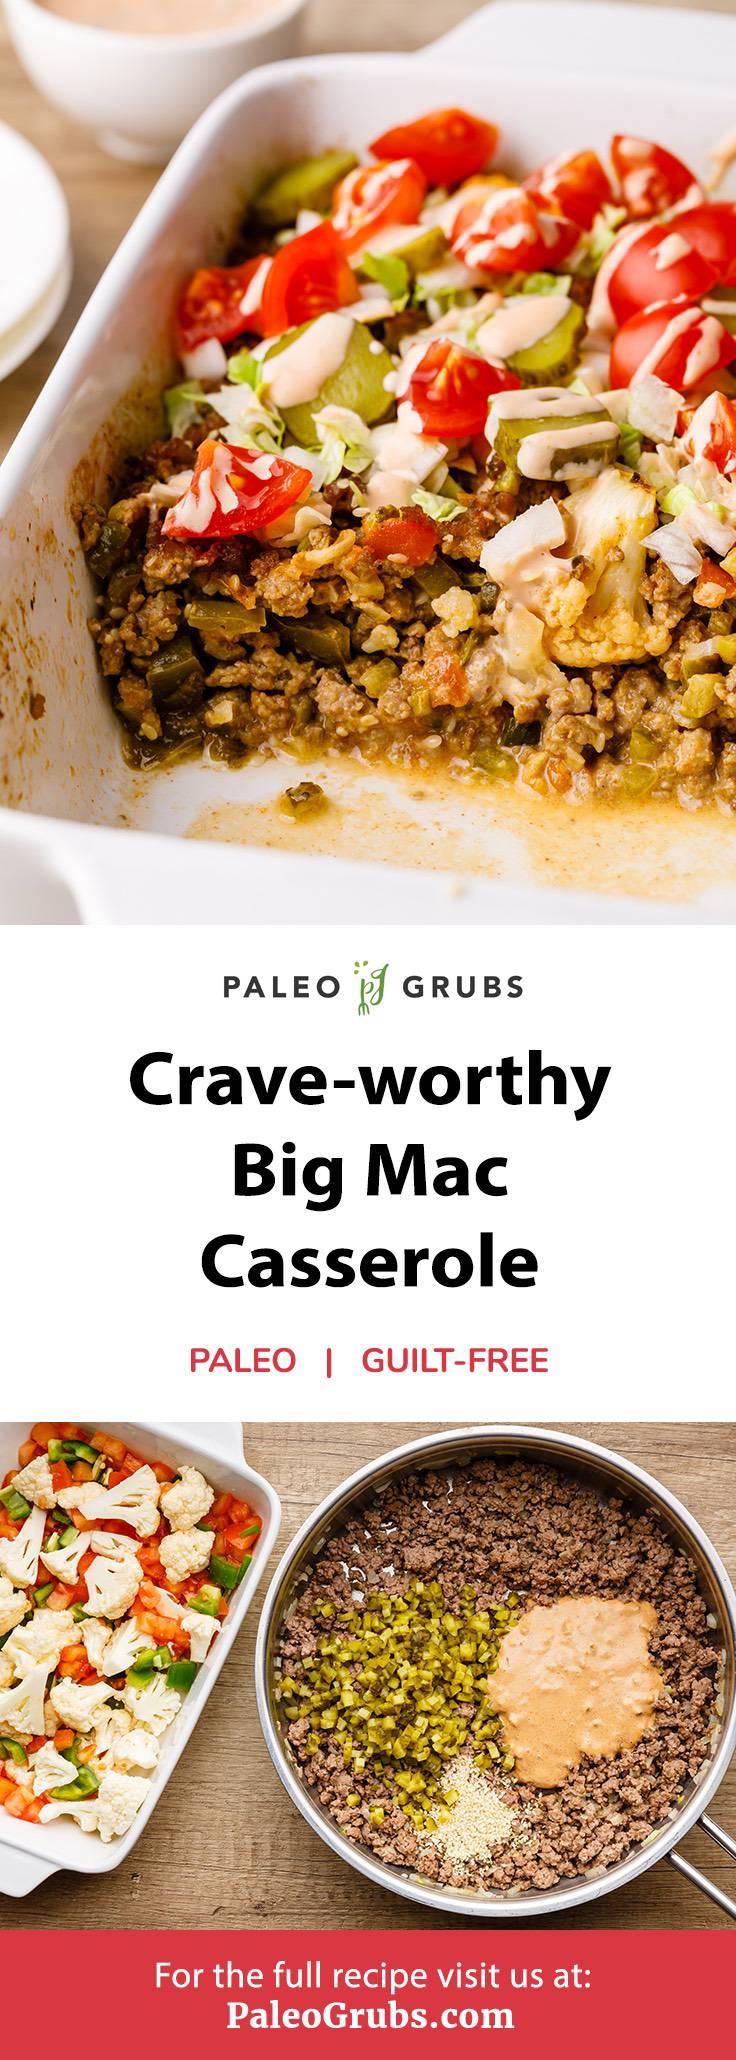 Big Mac Casserole